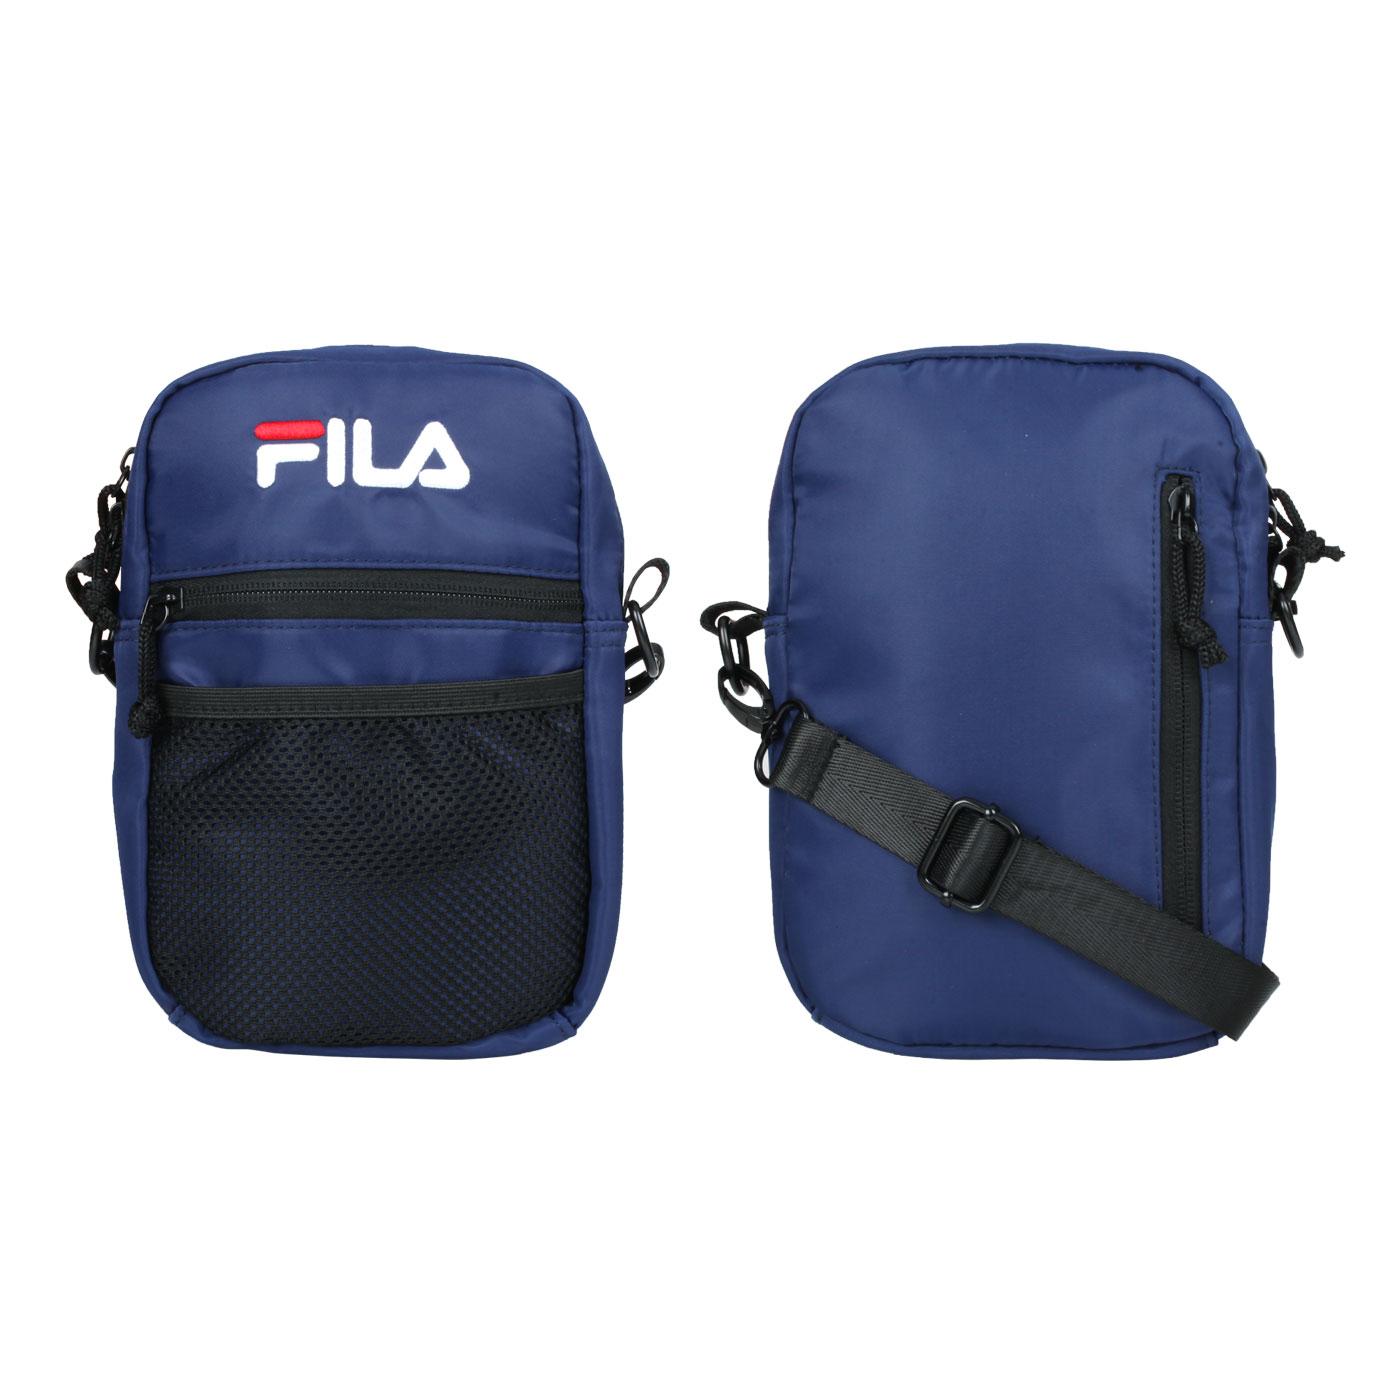 FILA 網袋夾層側背包 BMV-7009-NV